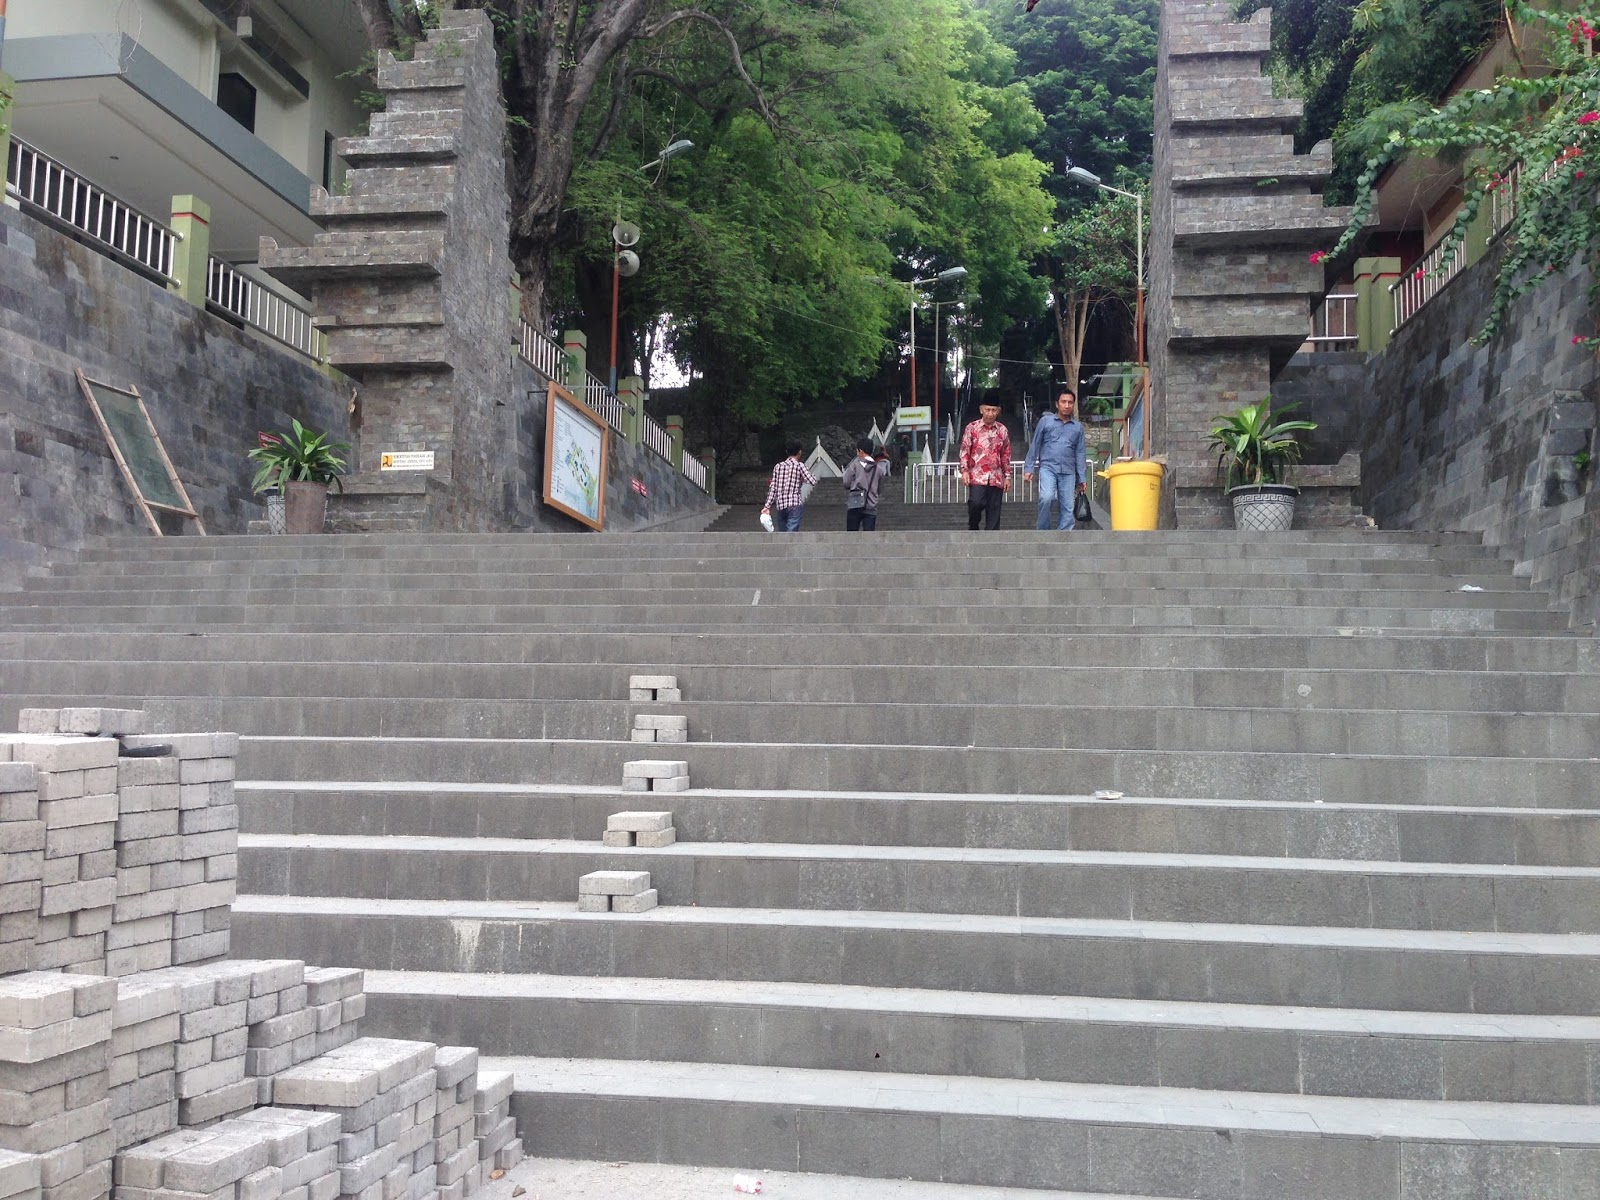 Indra Zone Wisata Religi Makam Sunan Gresik Gapura Giri Kab